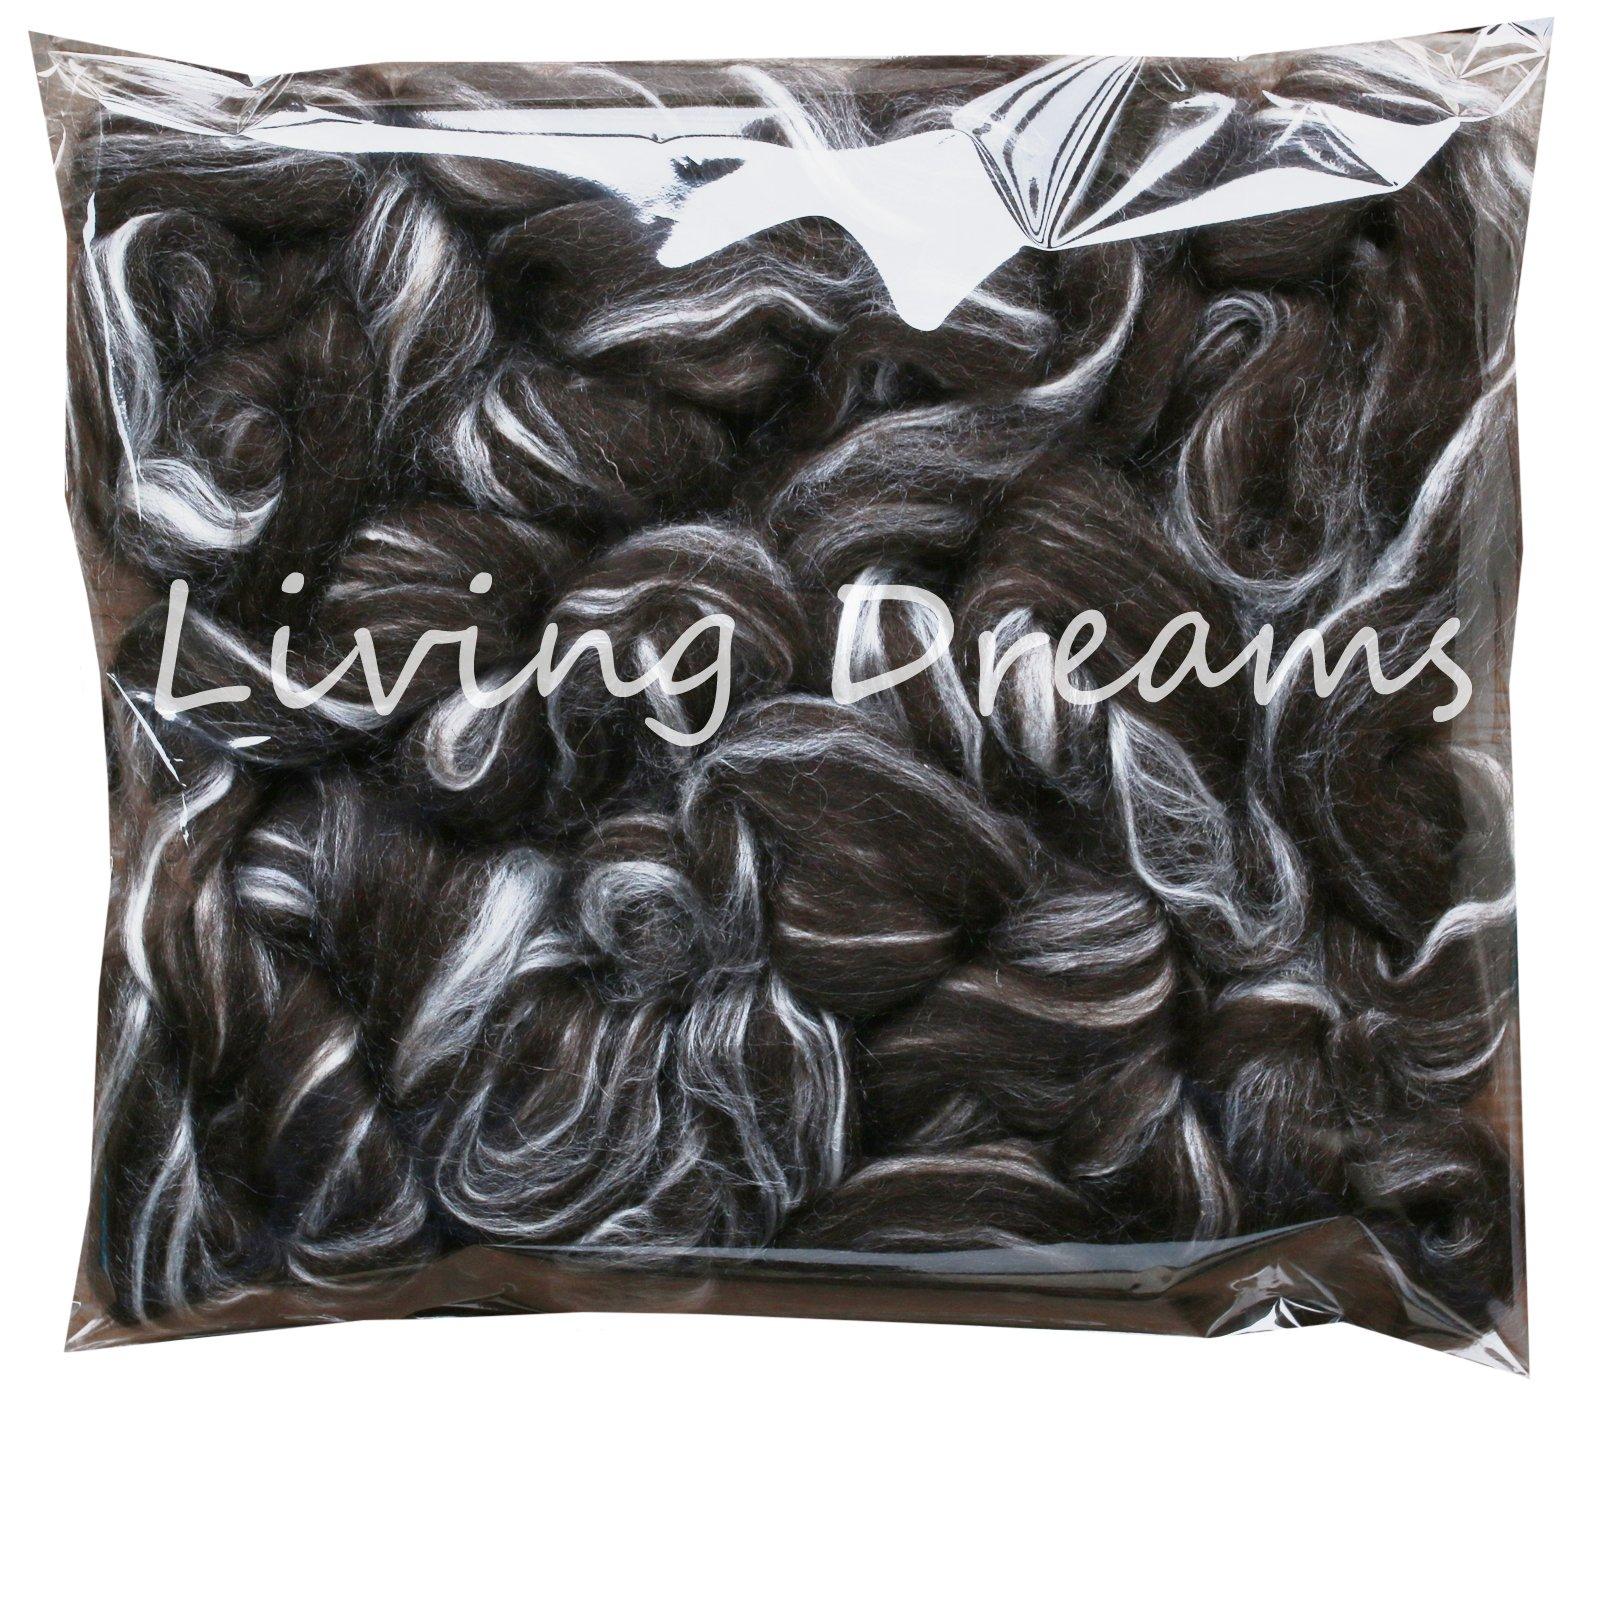 Shetland Wool TUSSAH Silk Combed Top Roving for Spinning, Felting, Blending. Soft & Lofty Fiber Blend, Natural Black